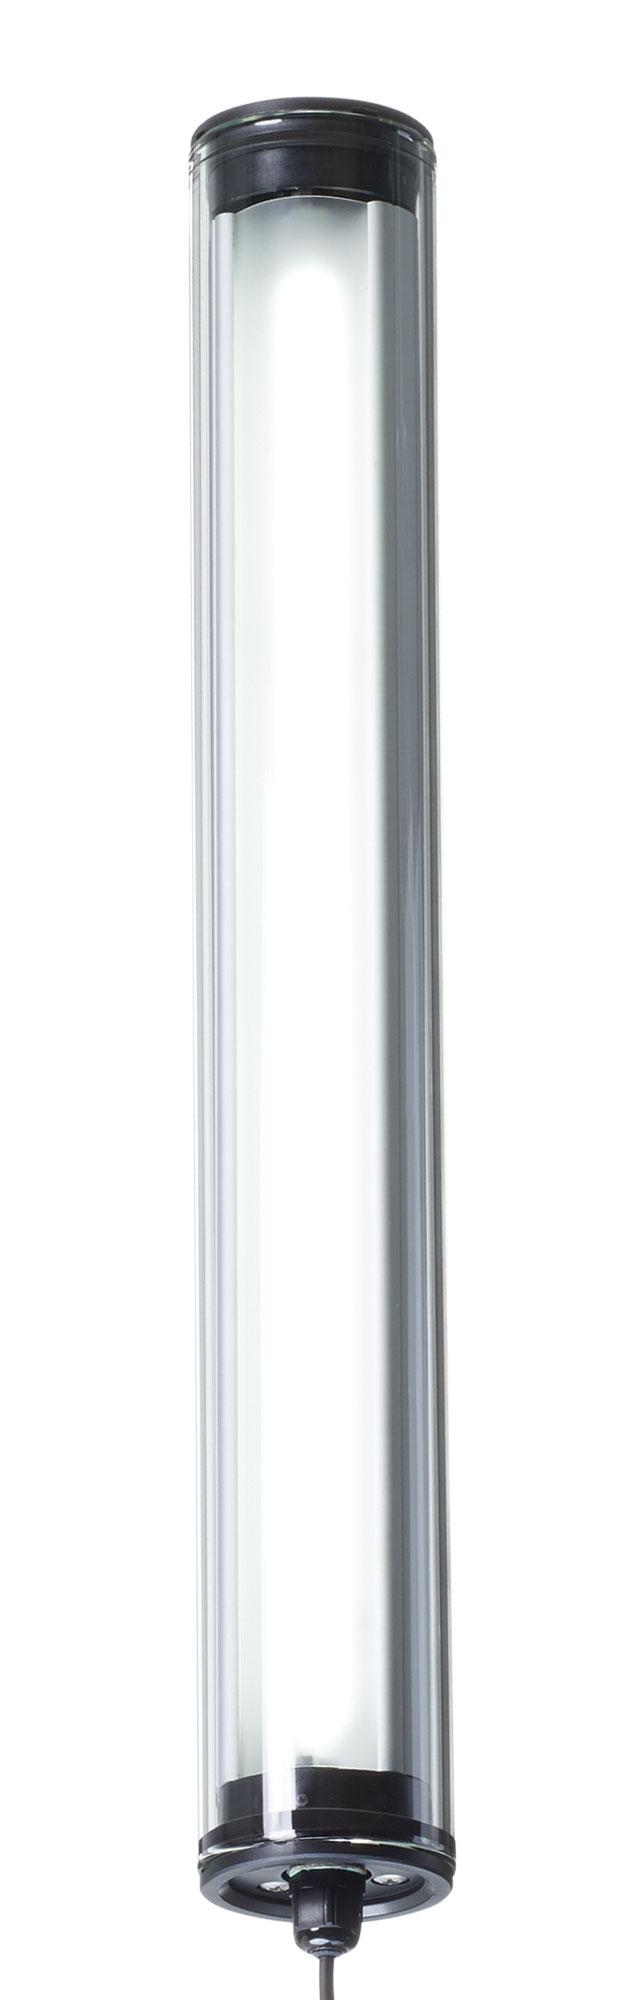 Waldmann Led Linear Machine Light Rl70le On Lighting